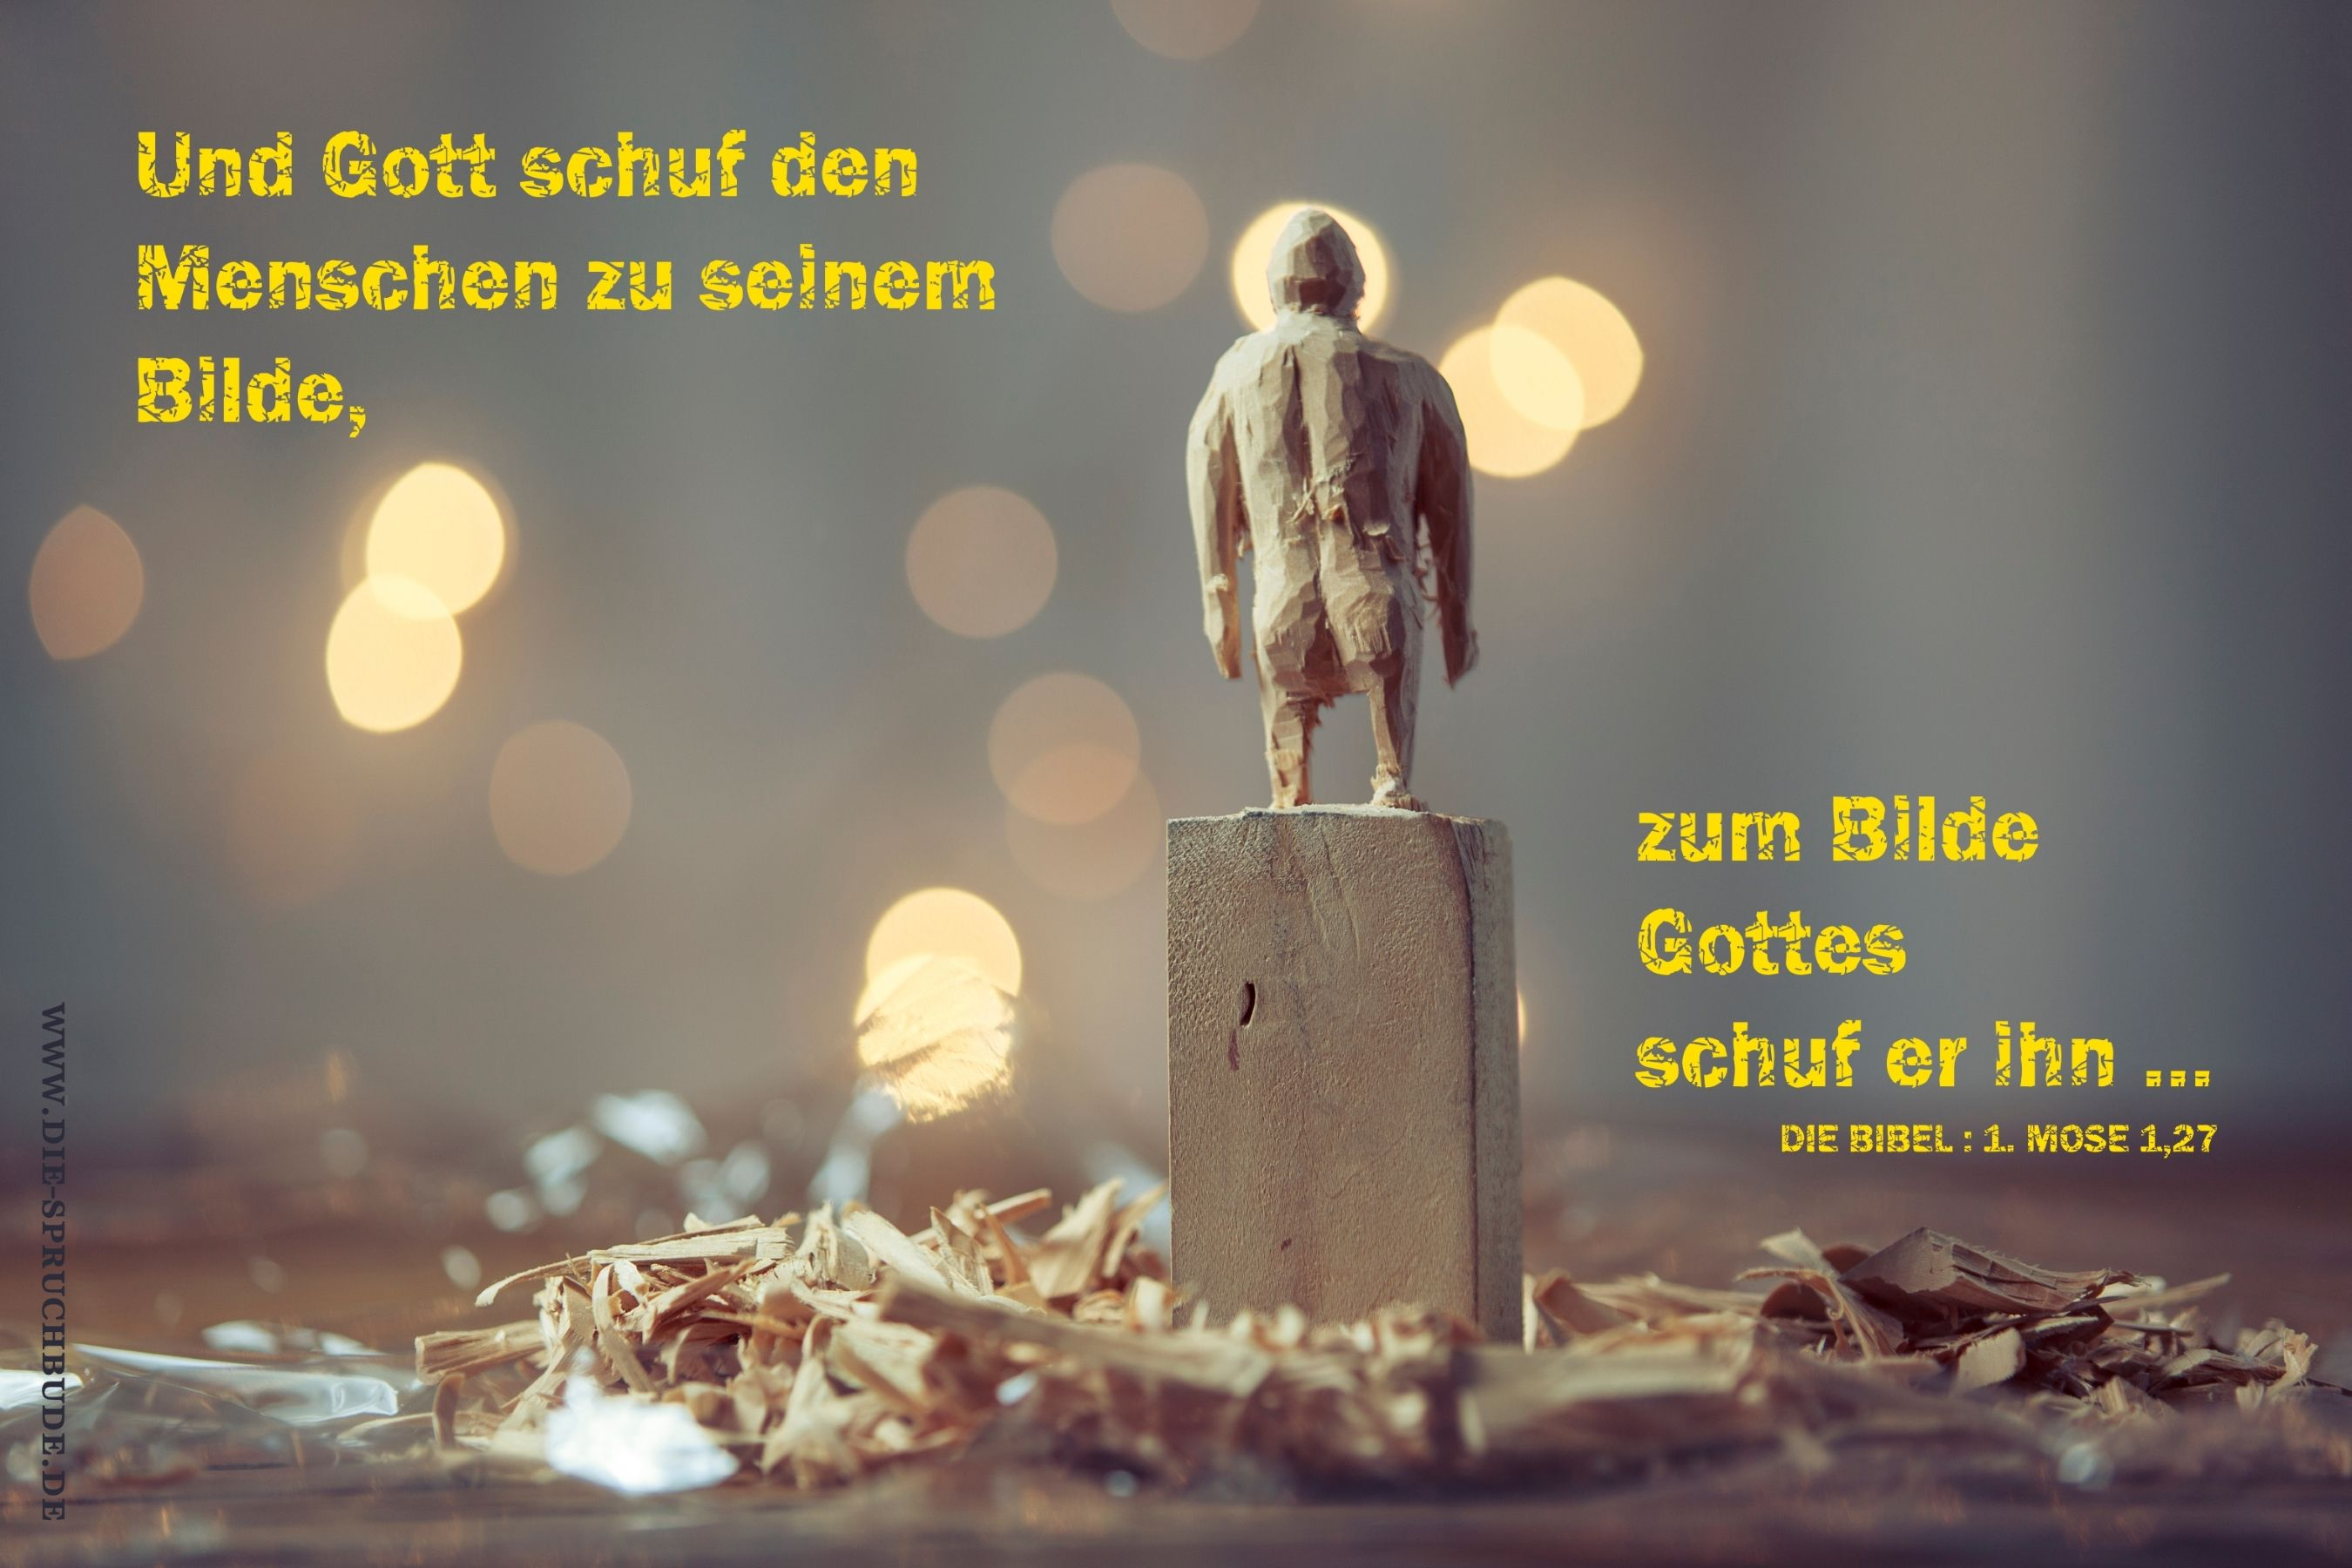 Schopfung Christliche Spruchkarte Grusskarte E Card  Www Spruchbude De Foto Vnz Photocase De